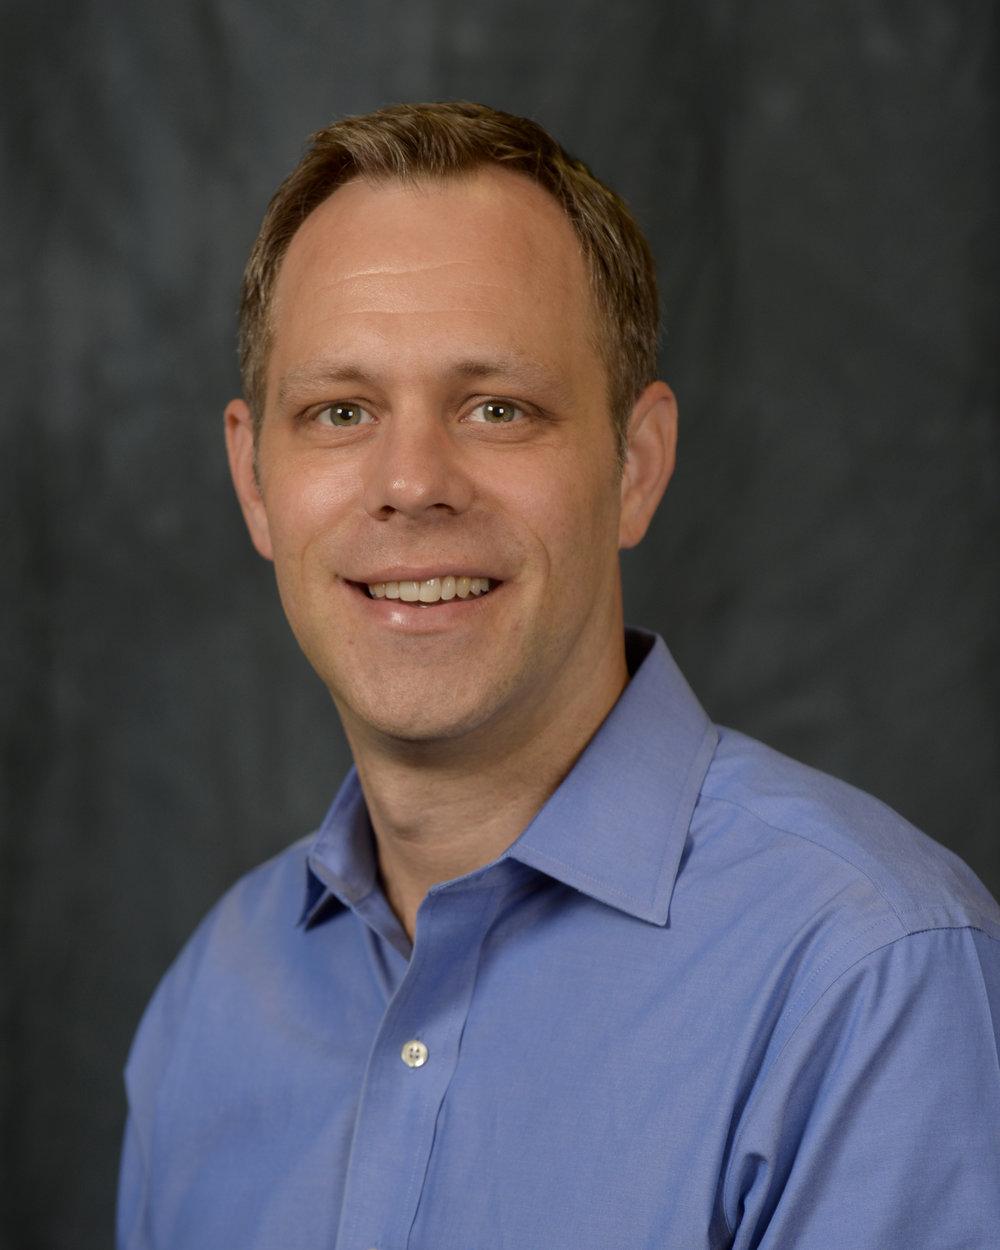 Dr. Andrew M. Hutson